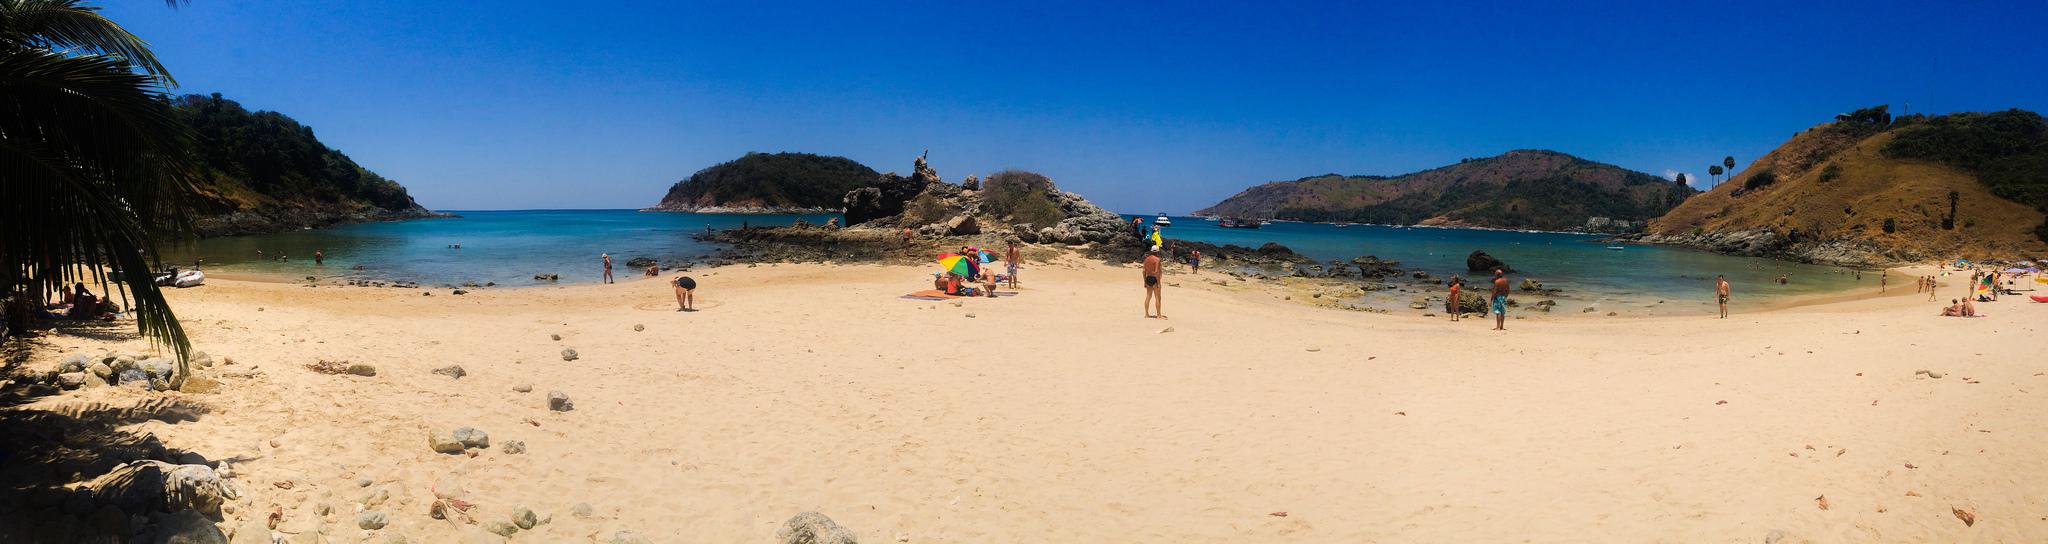 Panorama de la playa Nai Harn